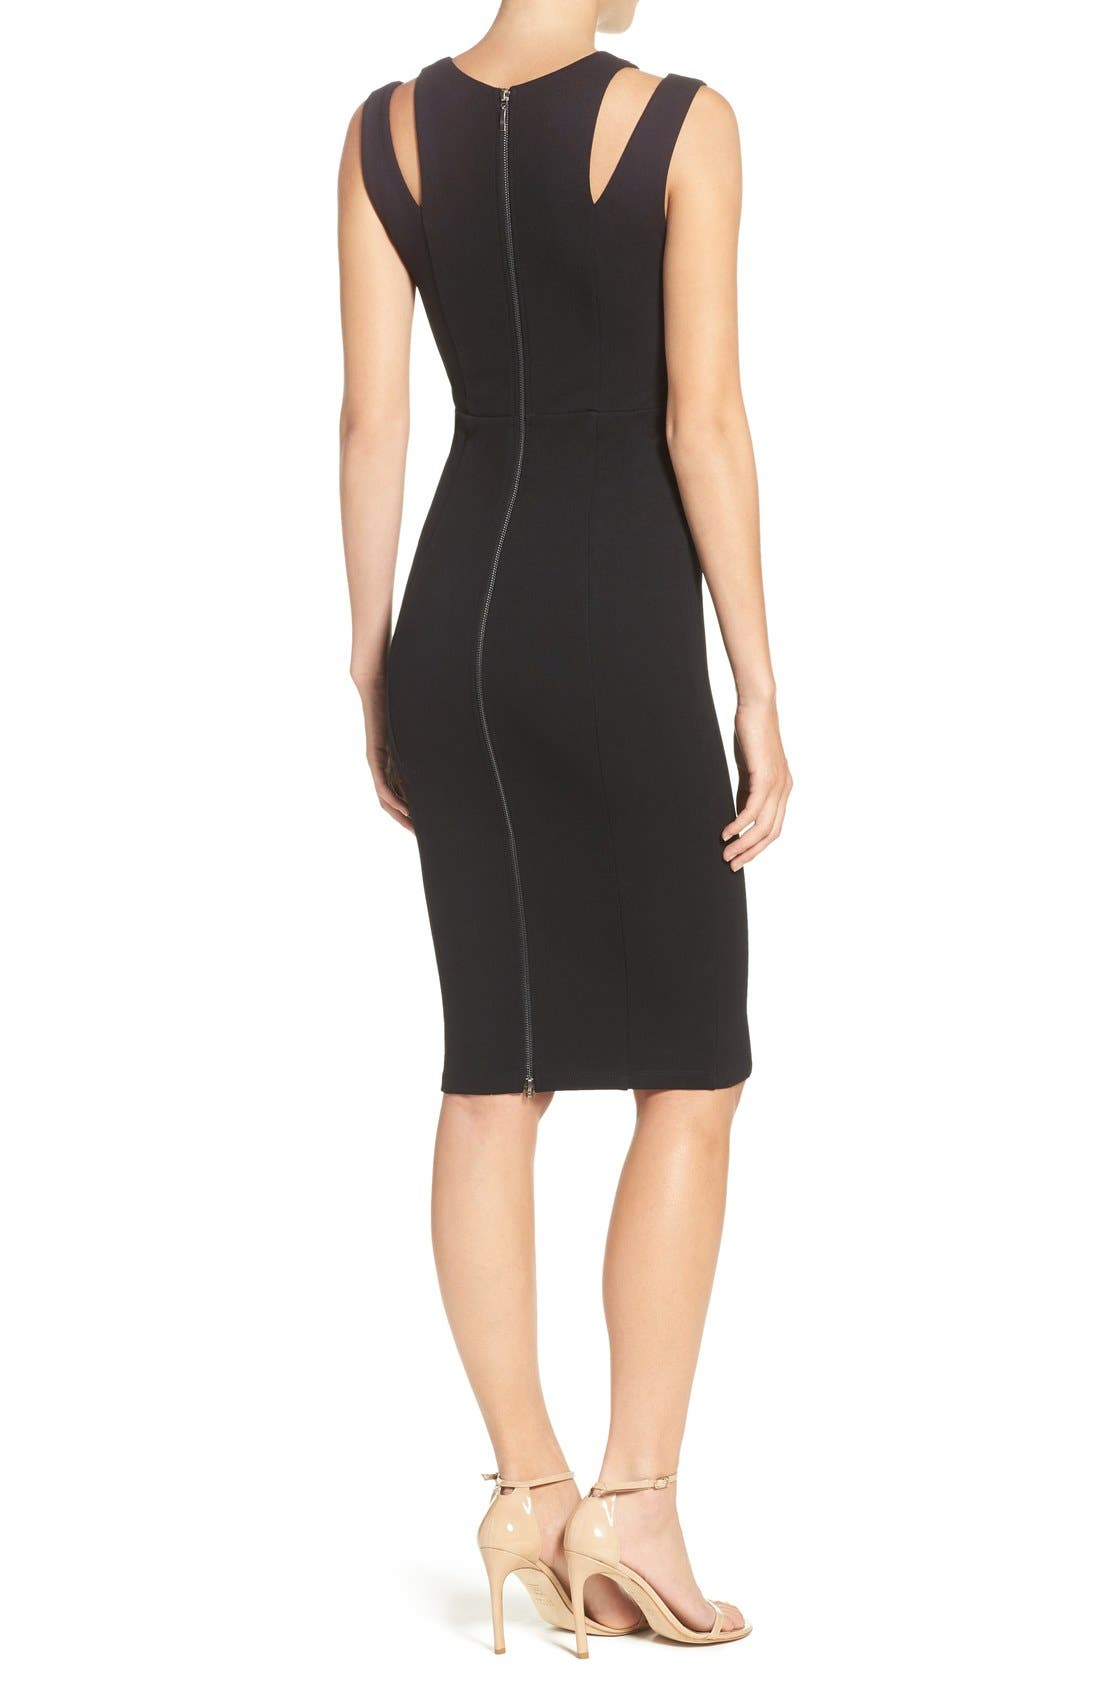 FELICITY & COCO, Shoulder Detail Ponte Sheath Dress, Alternate thumbnail 4, color, 001